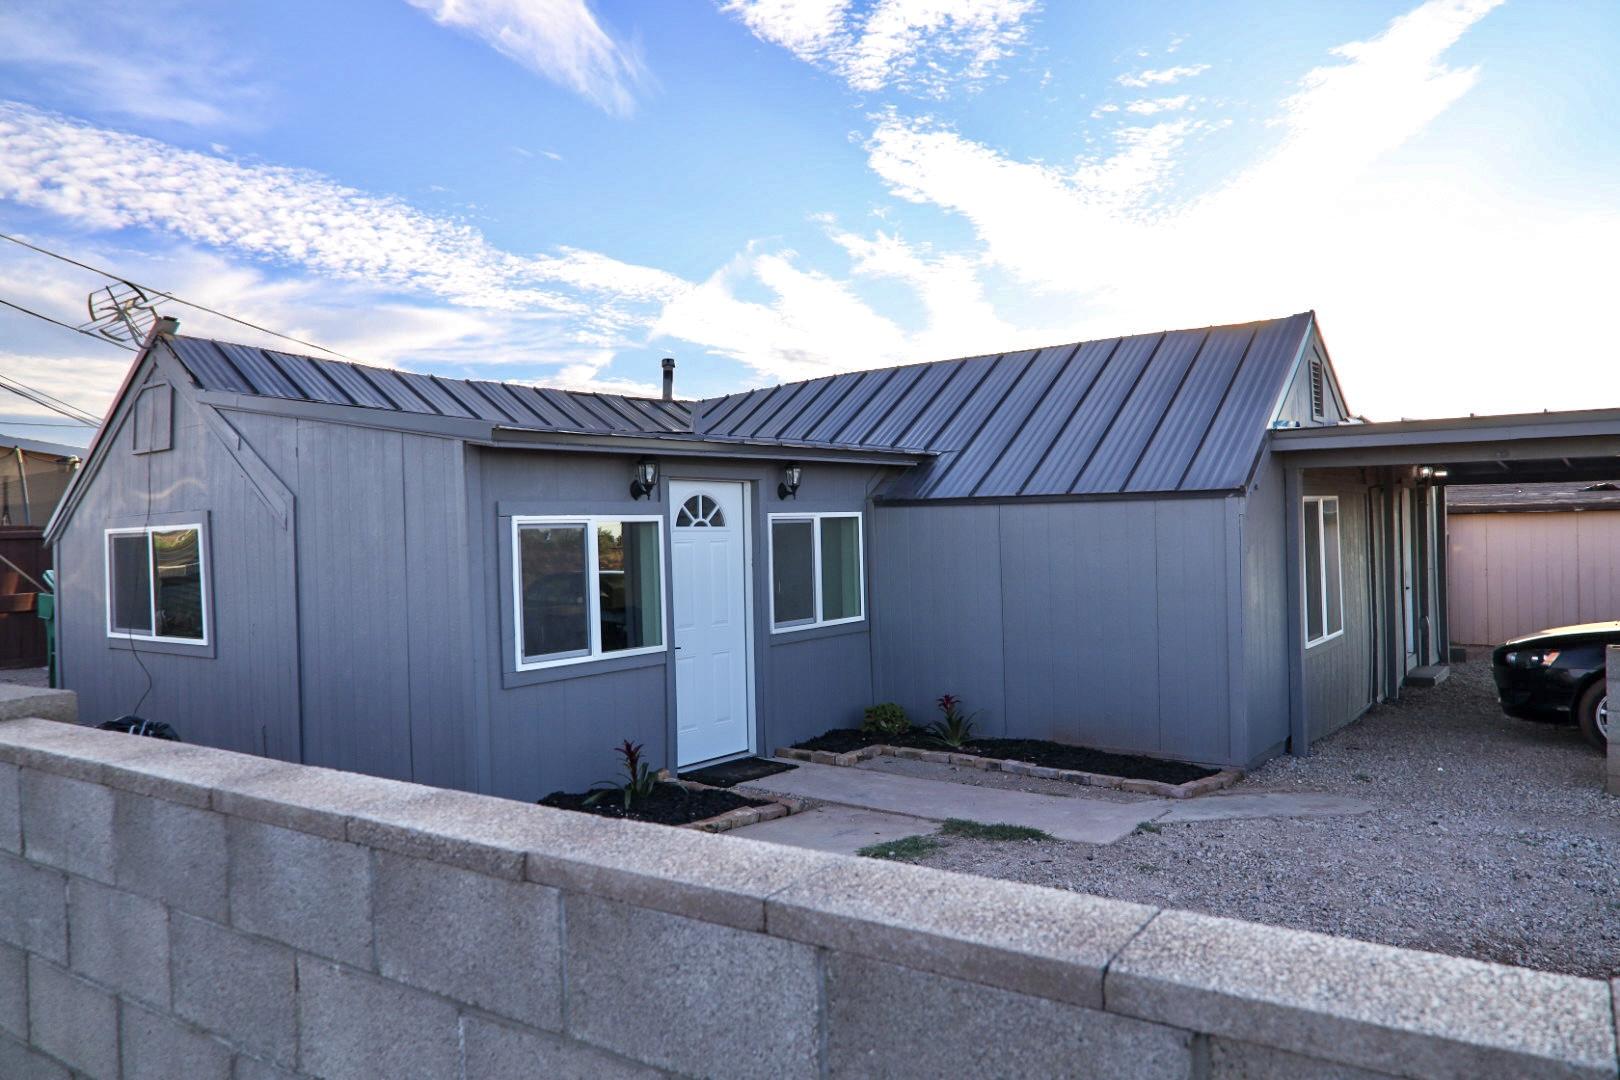 405 S Highway 87, Winslow, AZ 86047